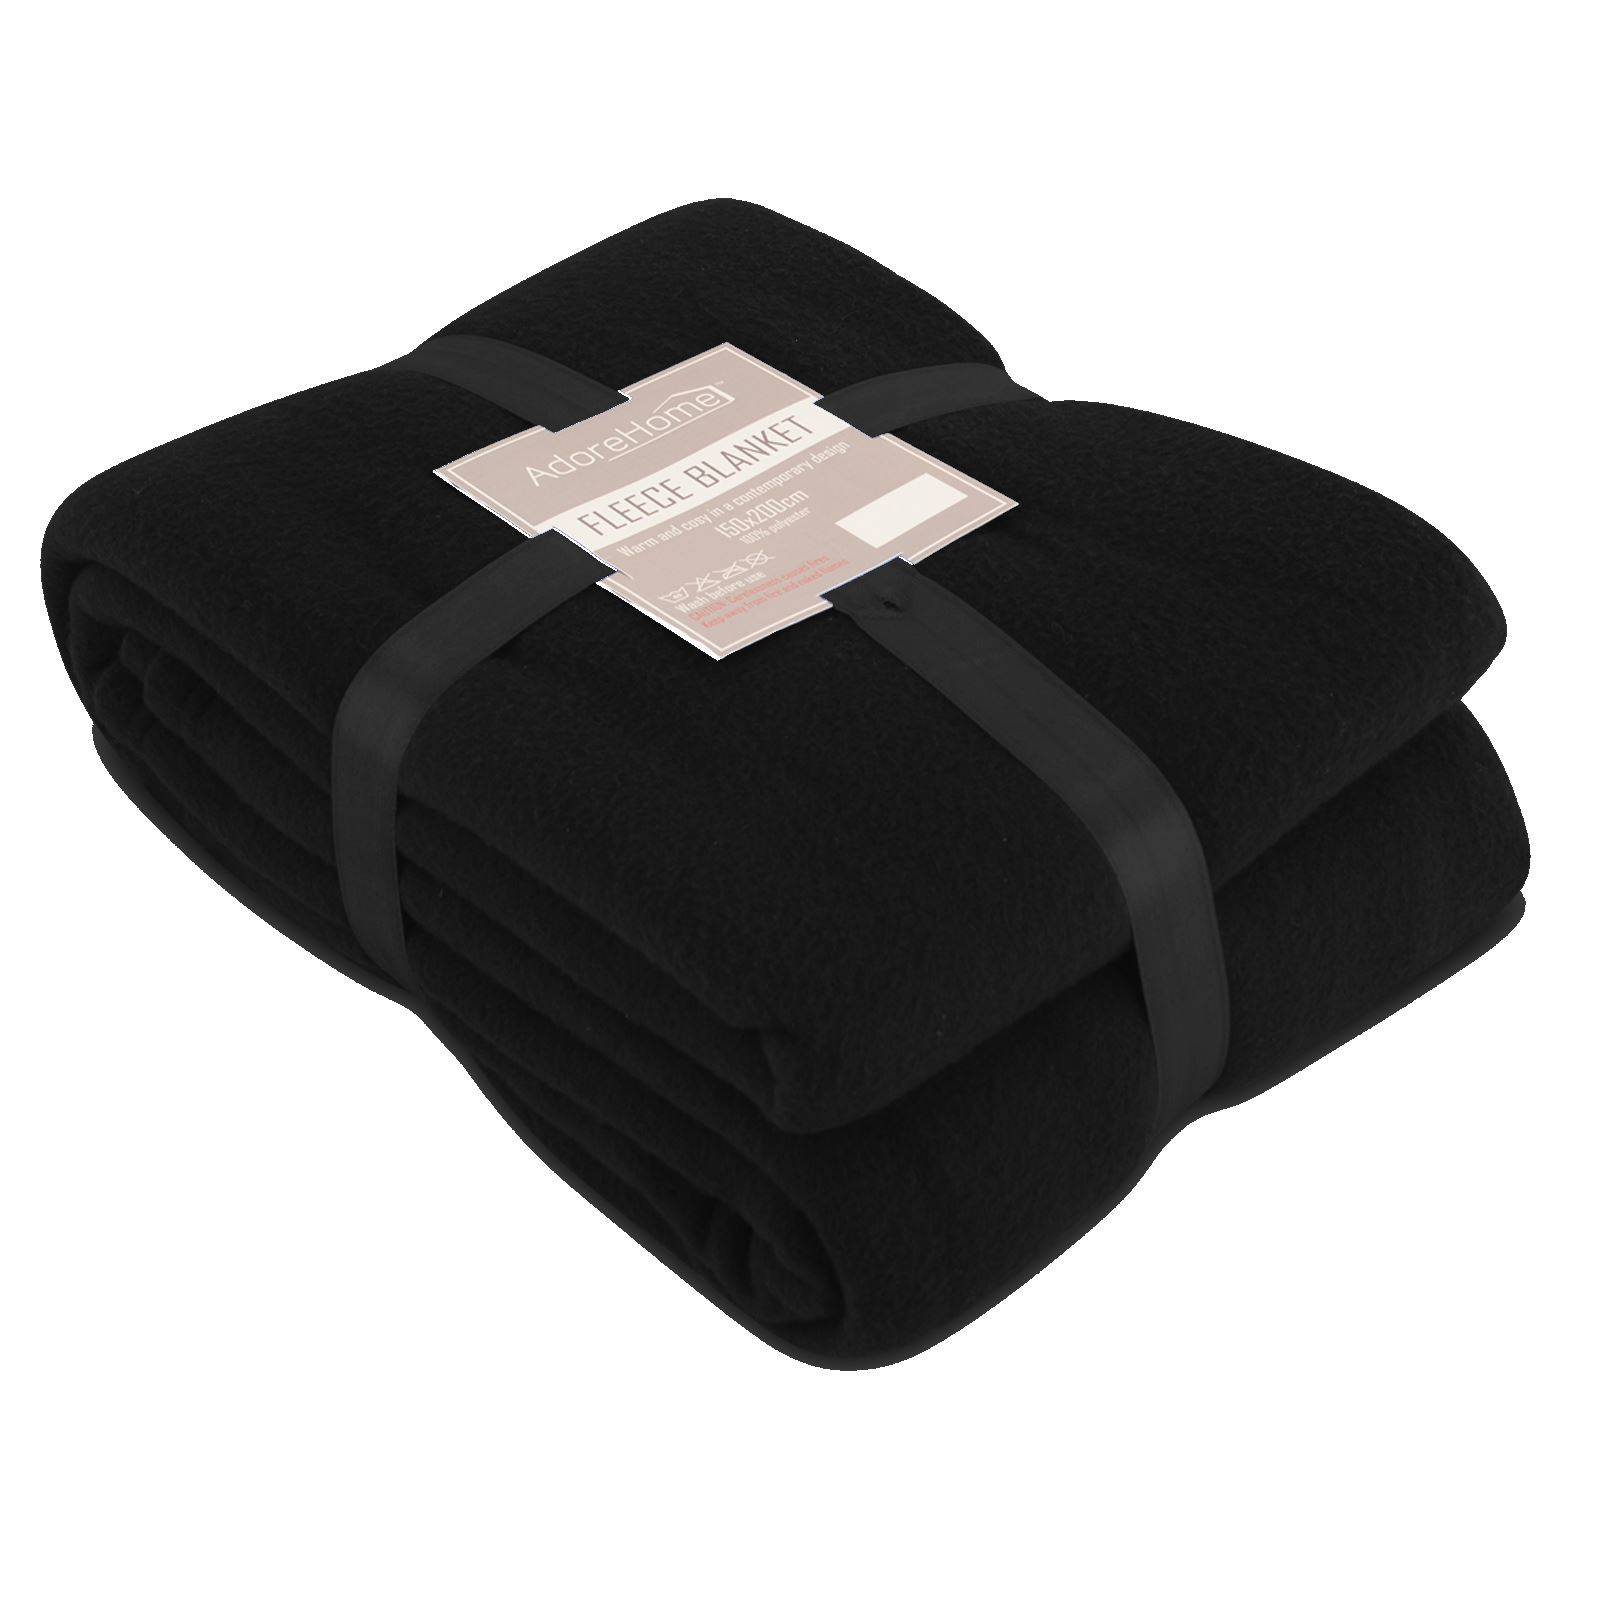 Luxury-Double-Size-Fleece-Throw-For-Sofa-Bed-Car-Travel-Car-Polar-Blanket